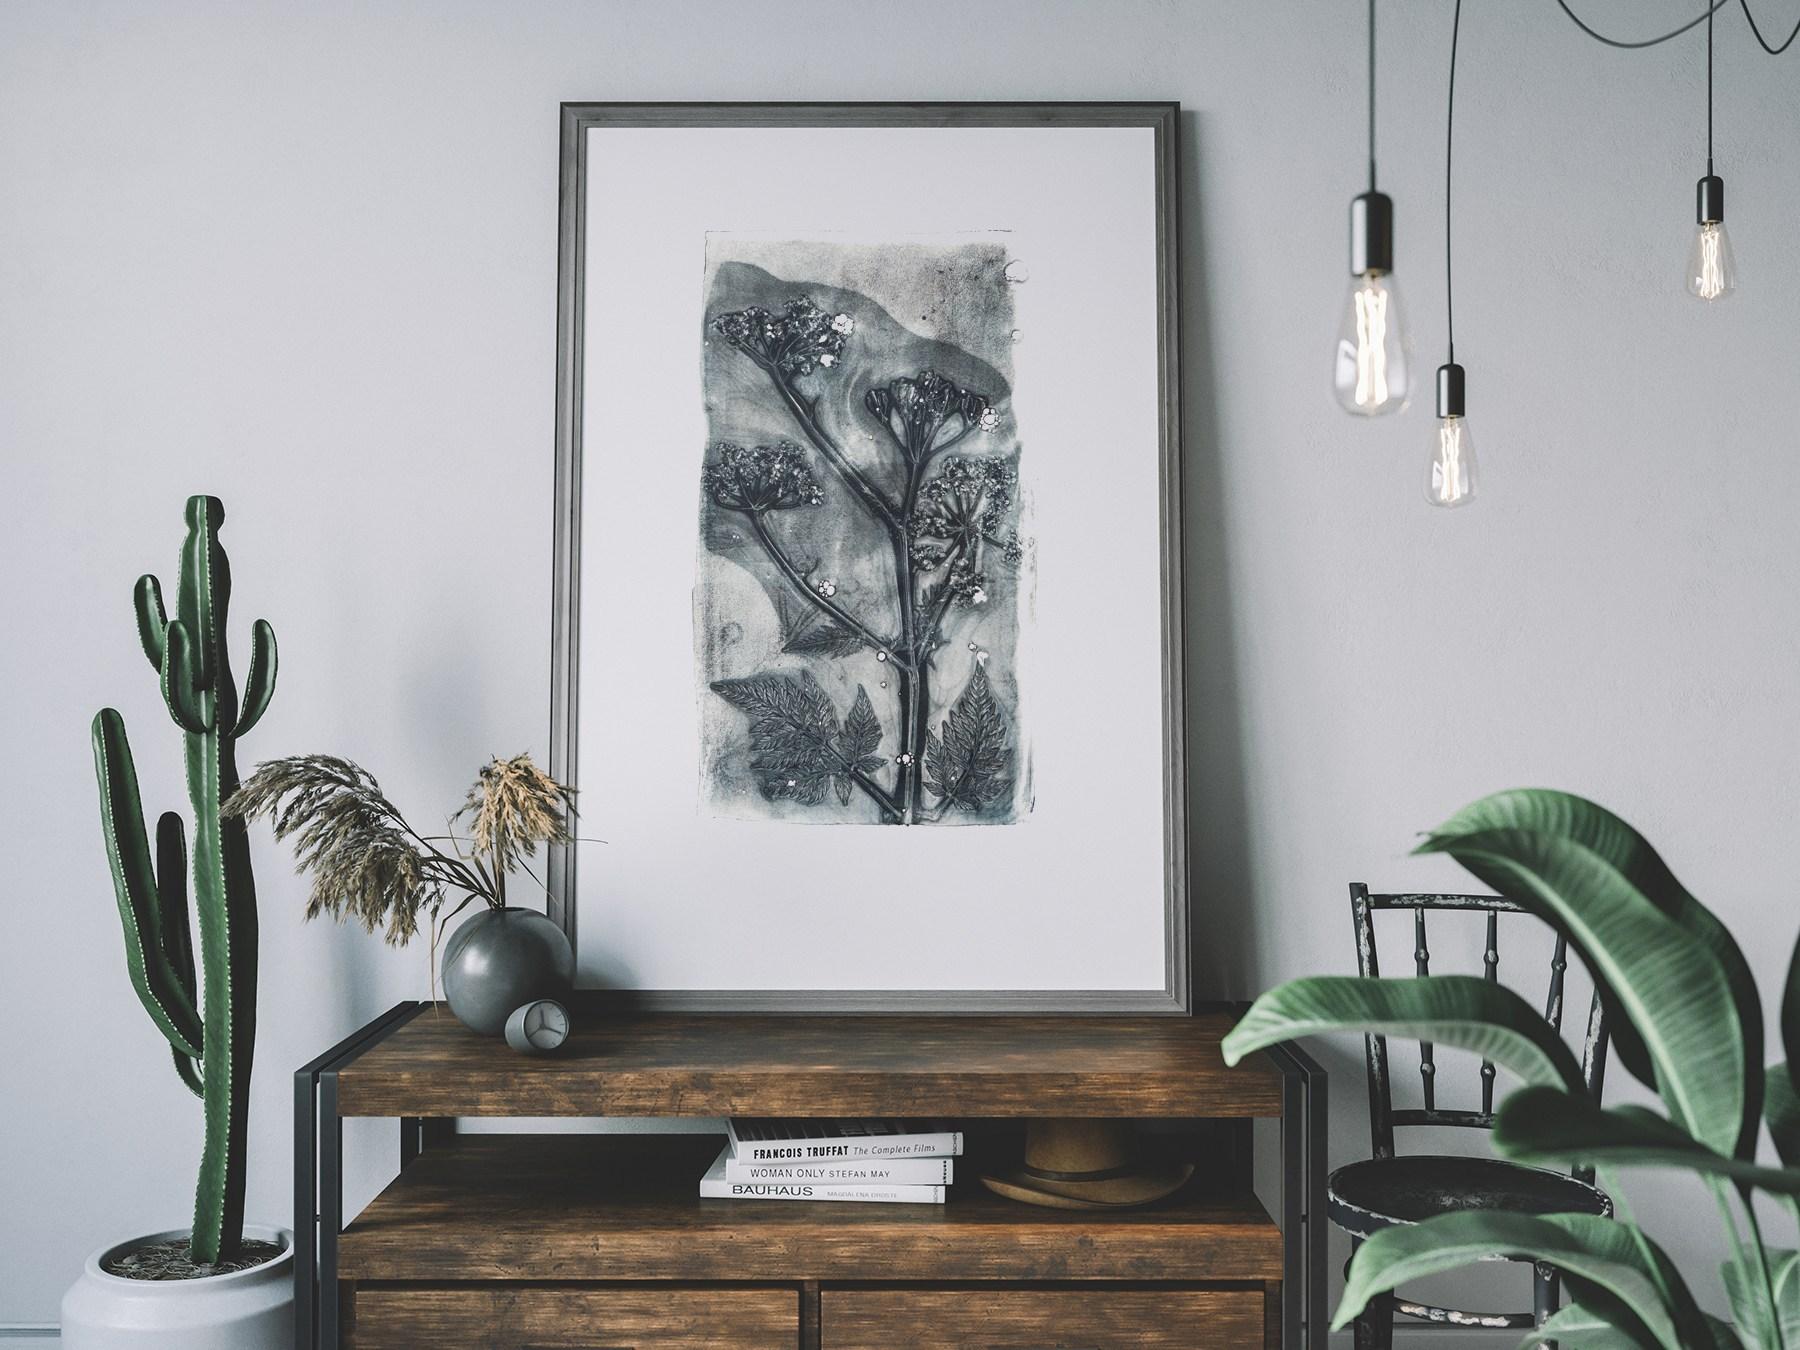 Fluitekruid kunst print vt wonen weer verliefd op je huis. Angela Peters Angelart